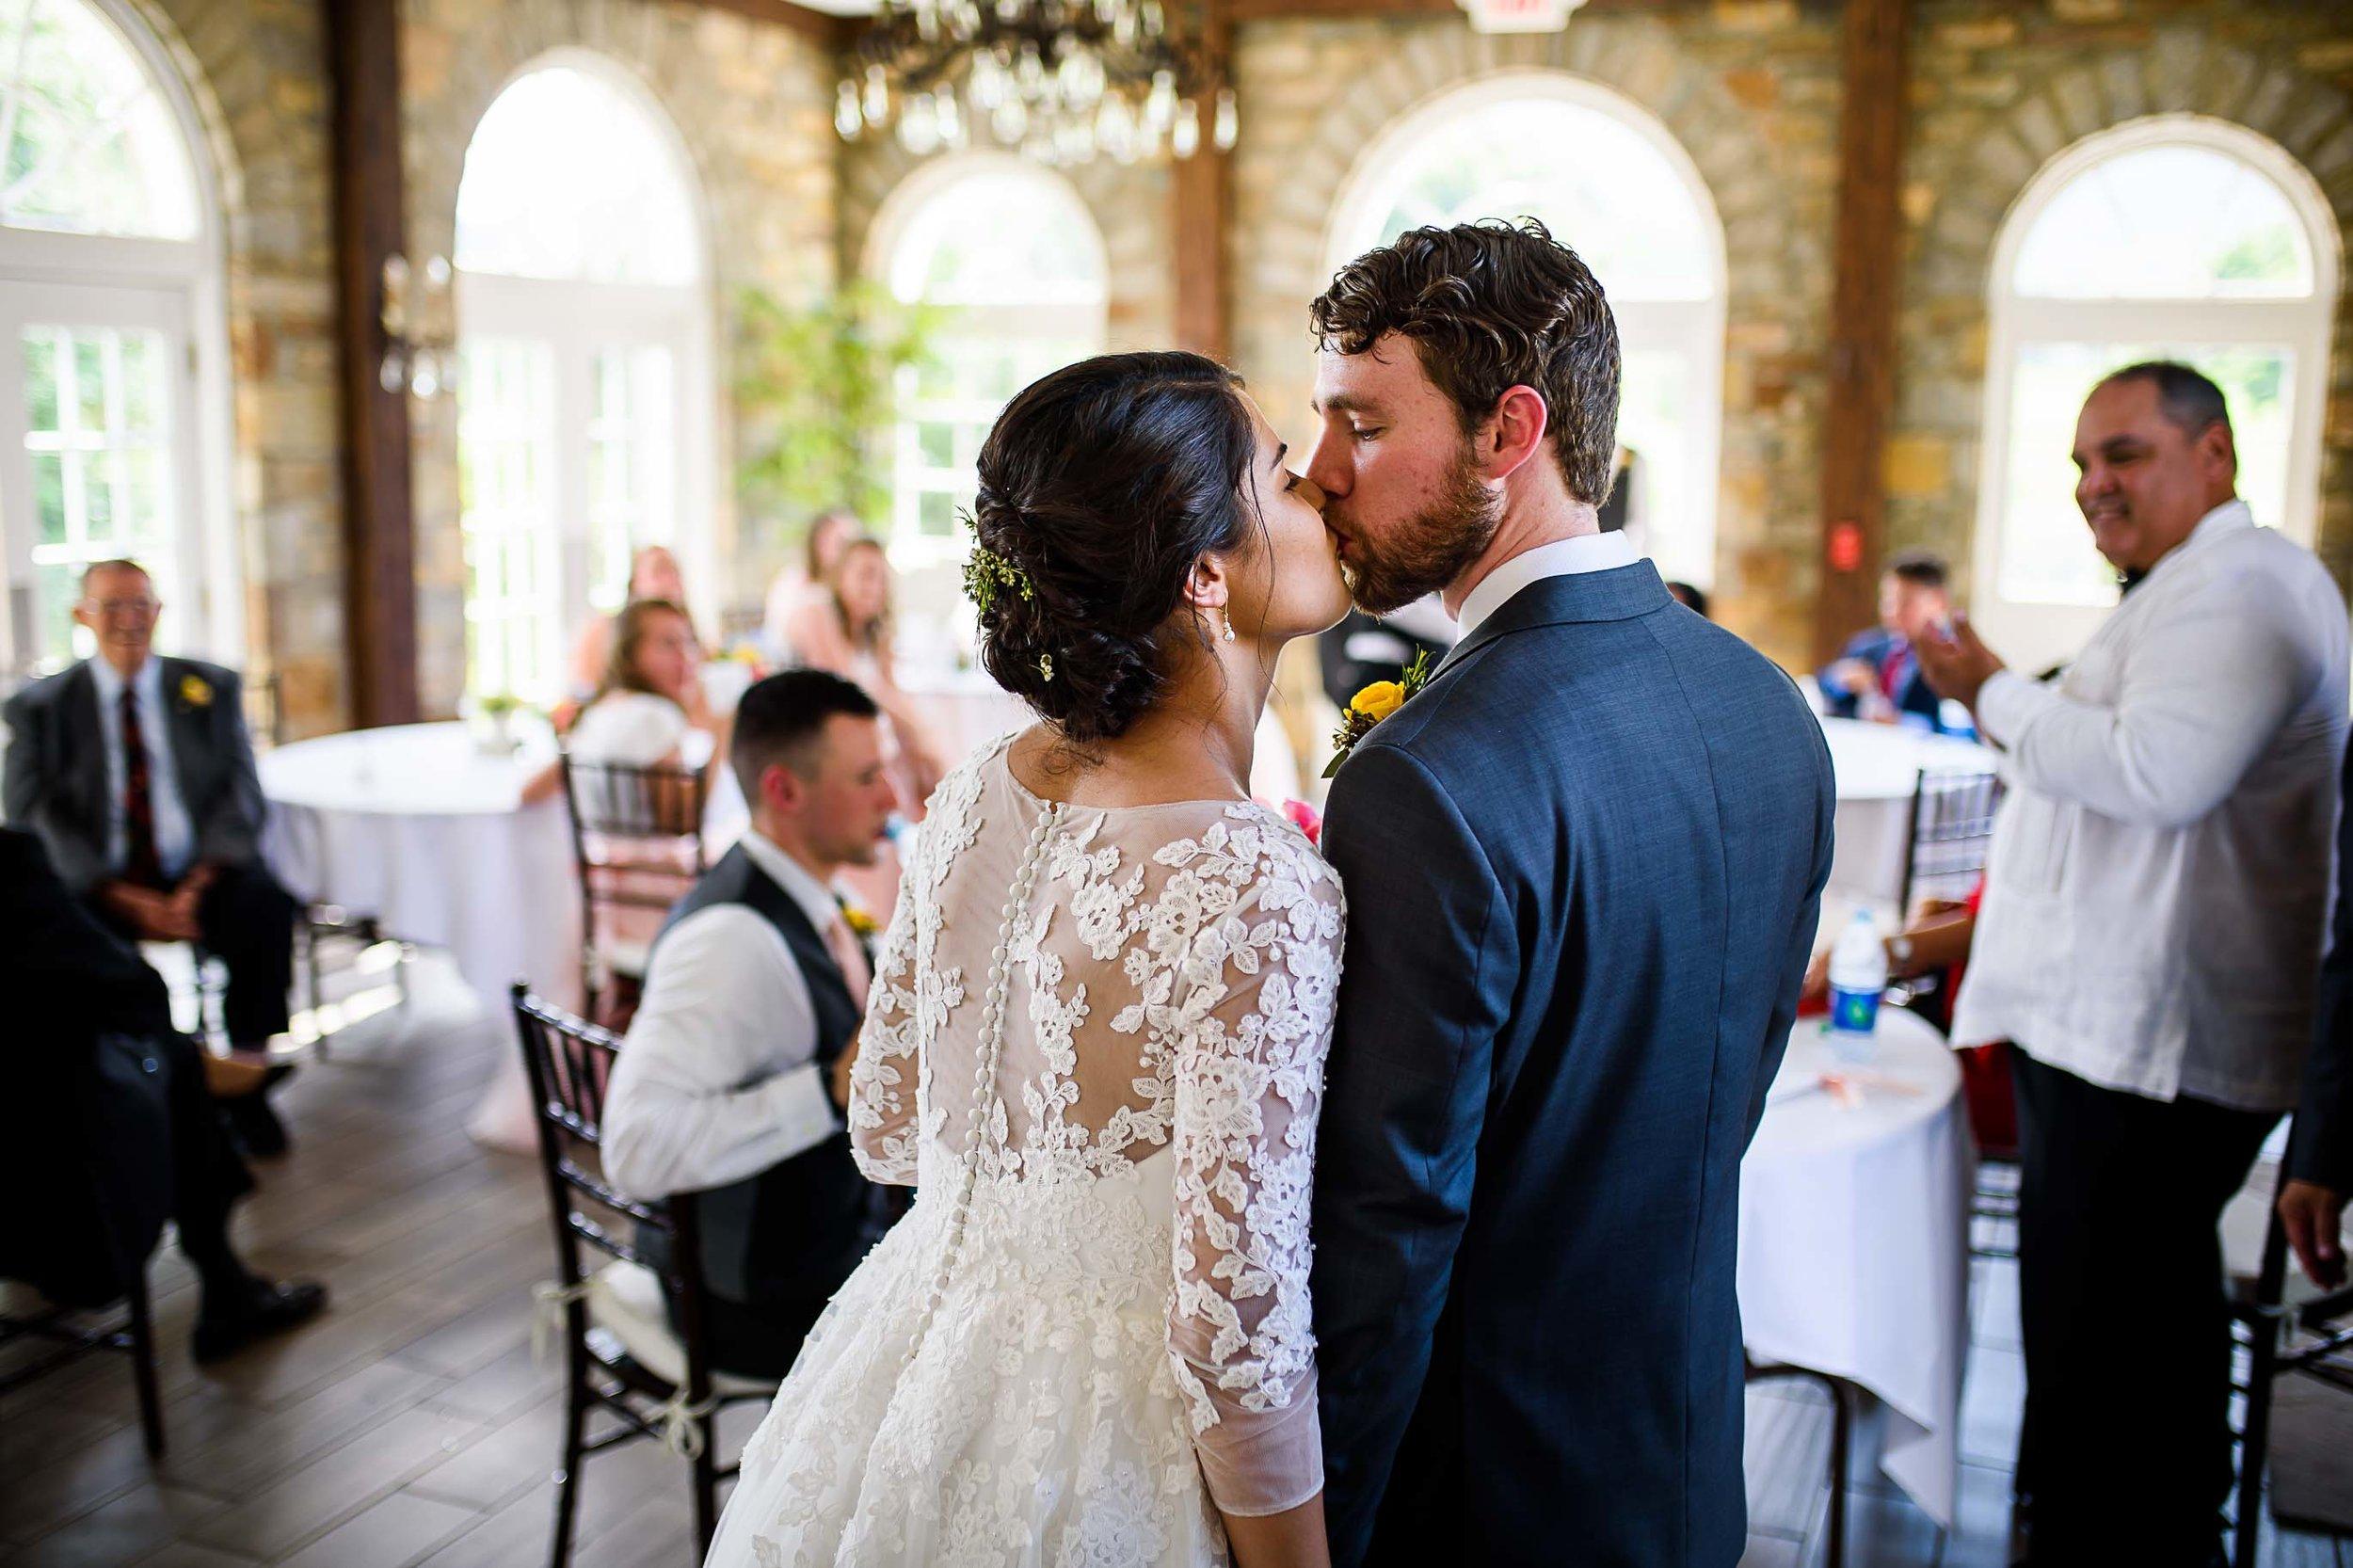 Evergreen Country Club wedding photos51.jpg